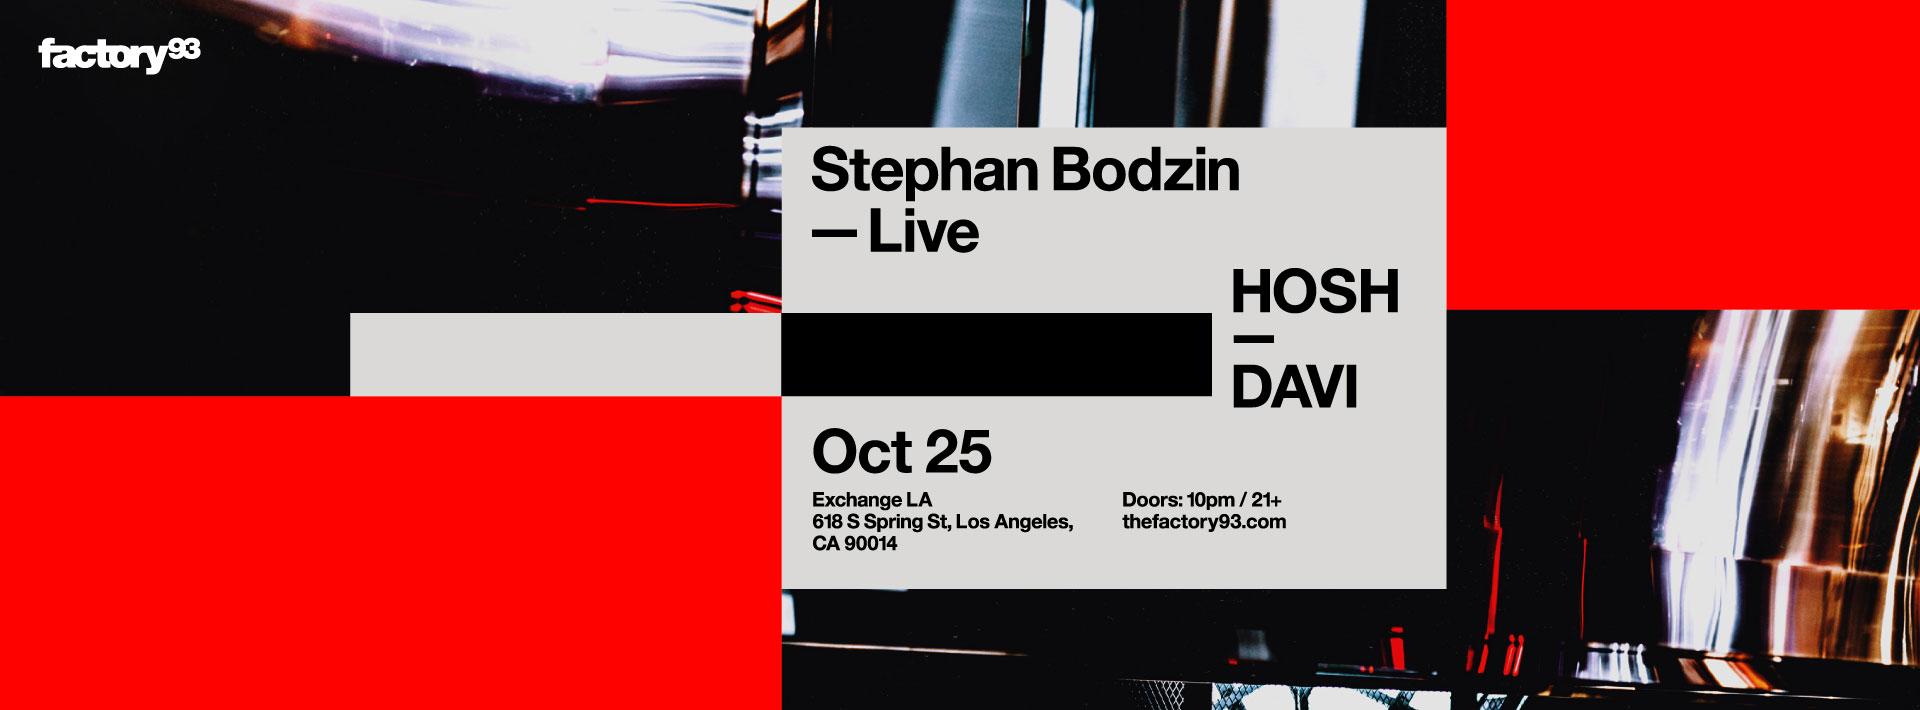 Stephan Bodzin (live), HOSH, DAVI